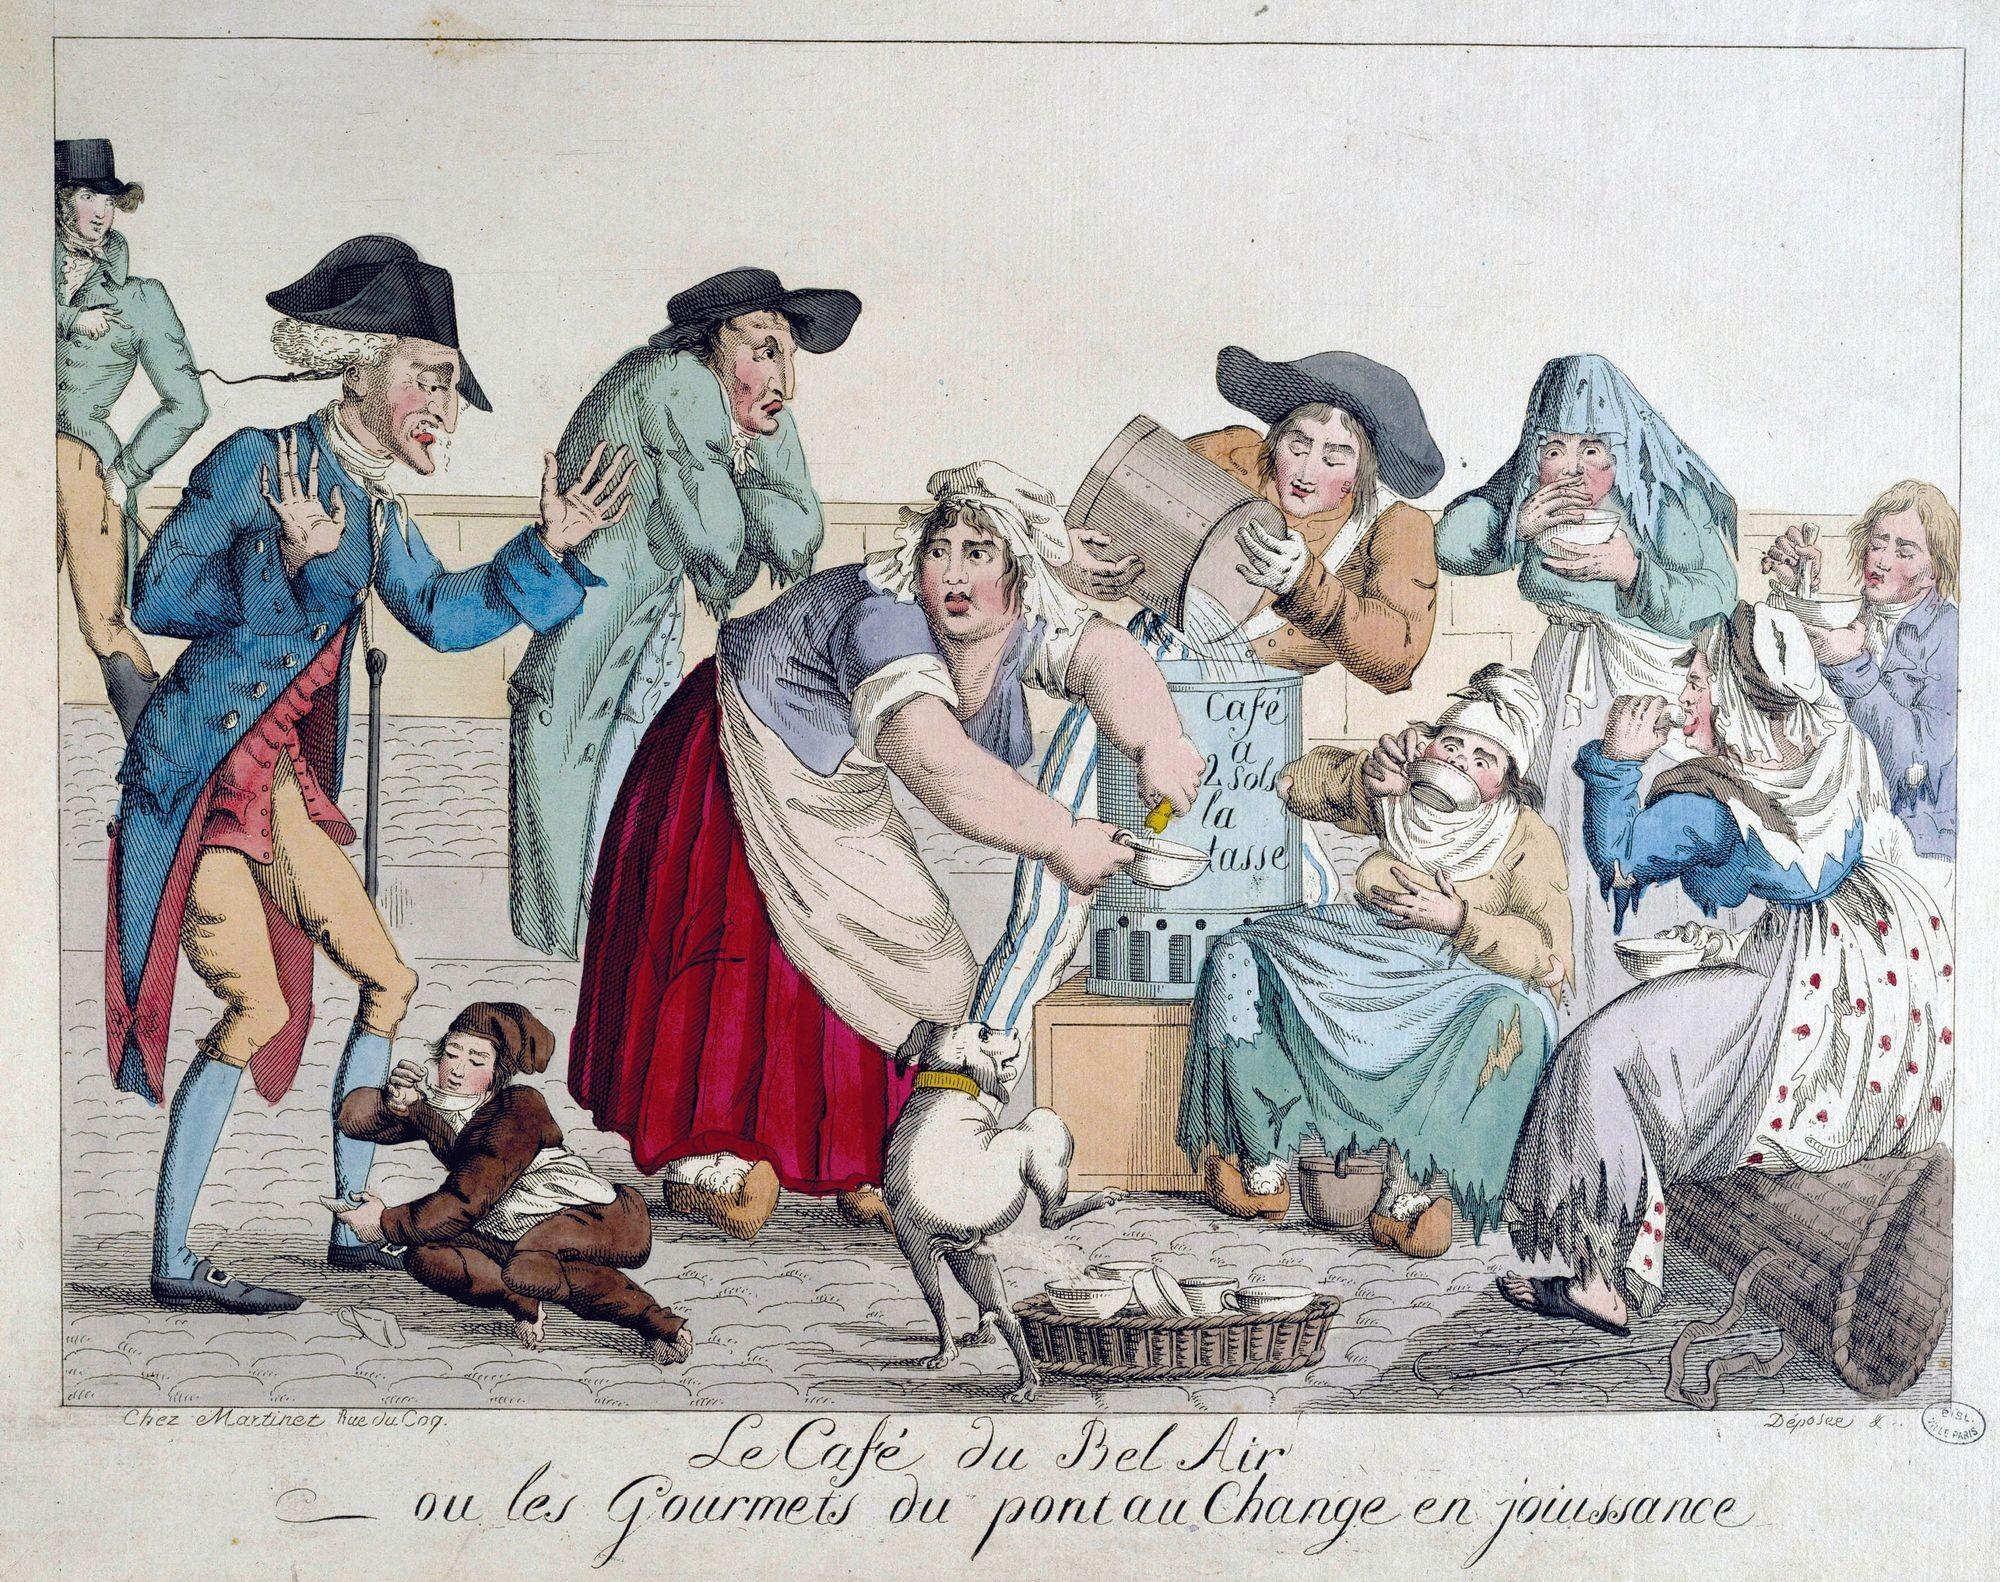 Estampe anonyme, XVIIIe siècle musée Carnavalet, Paris